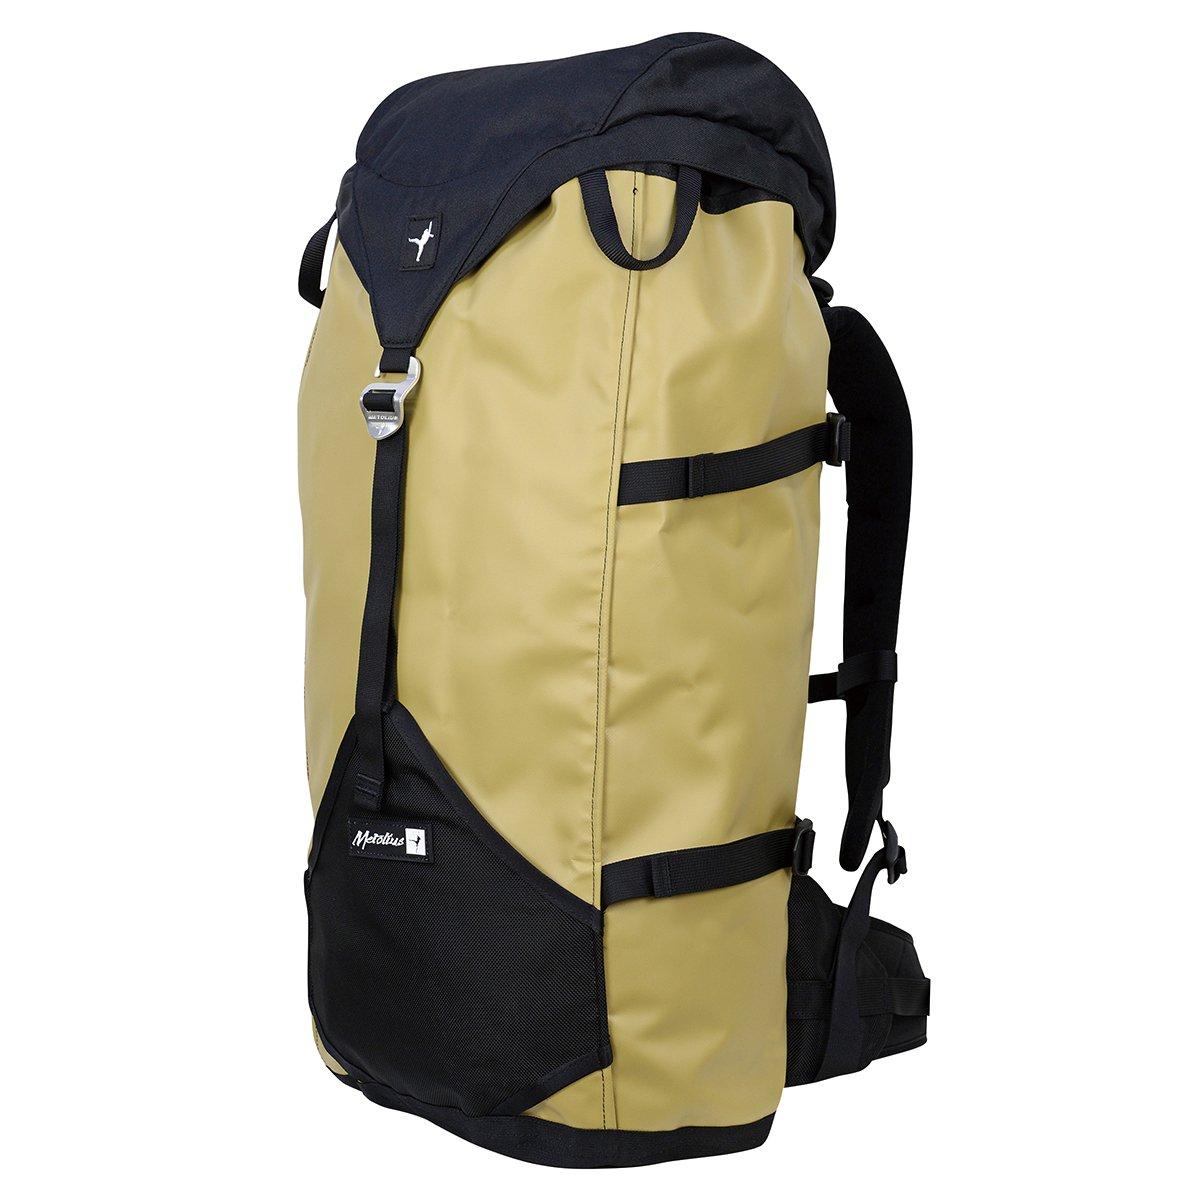 Metolius Freerider Pack Haul bags Tan by Metolius (Image #1)